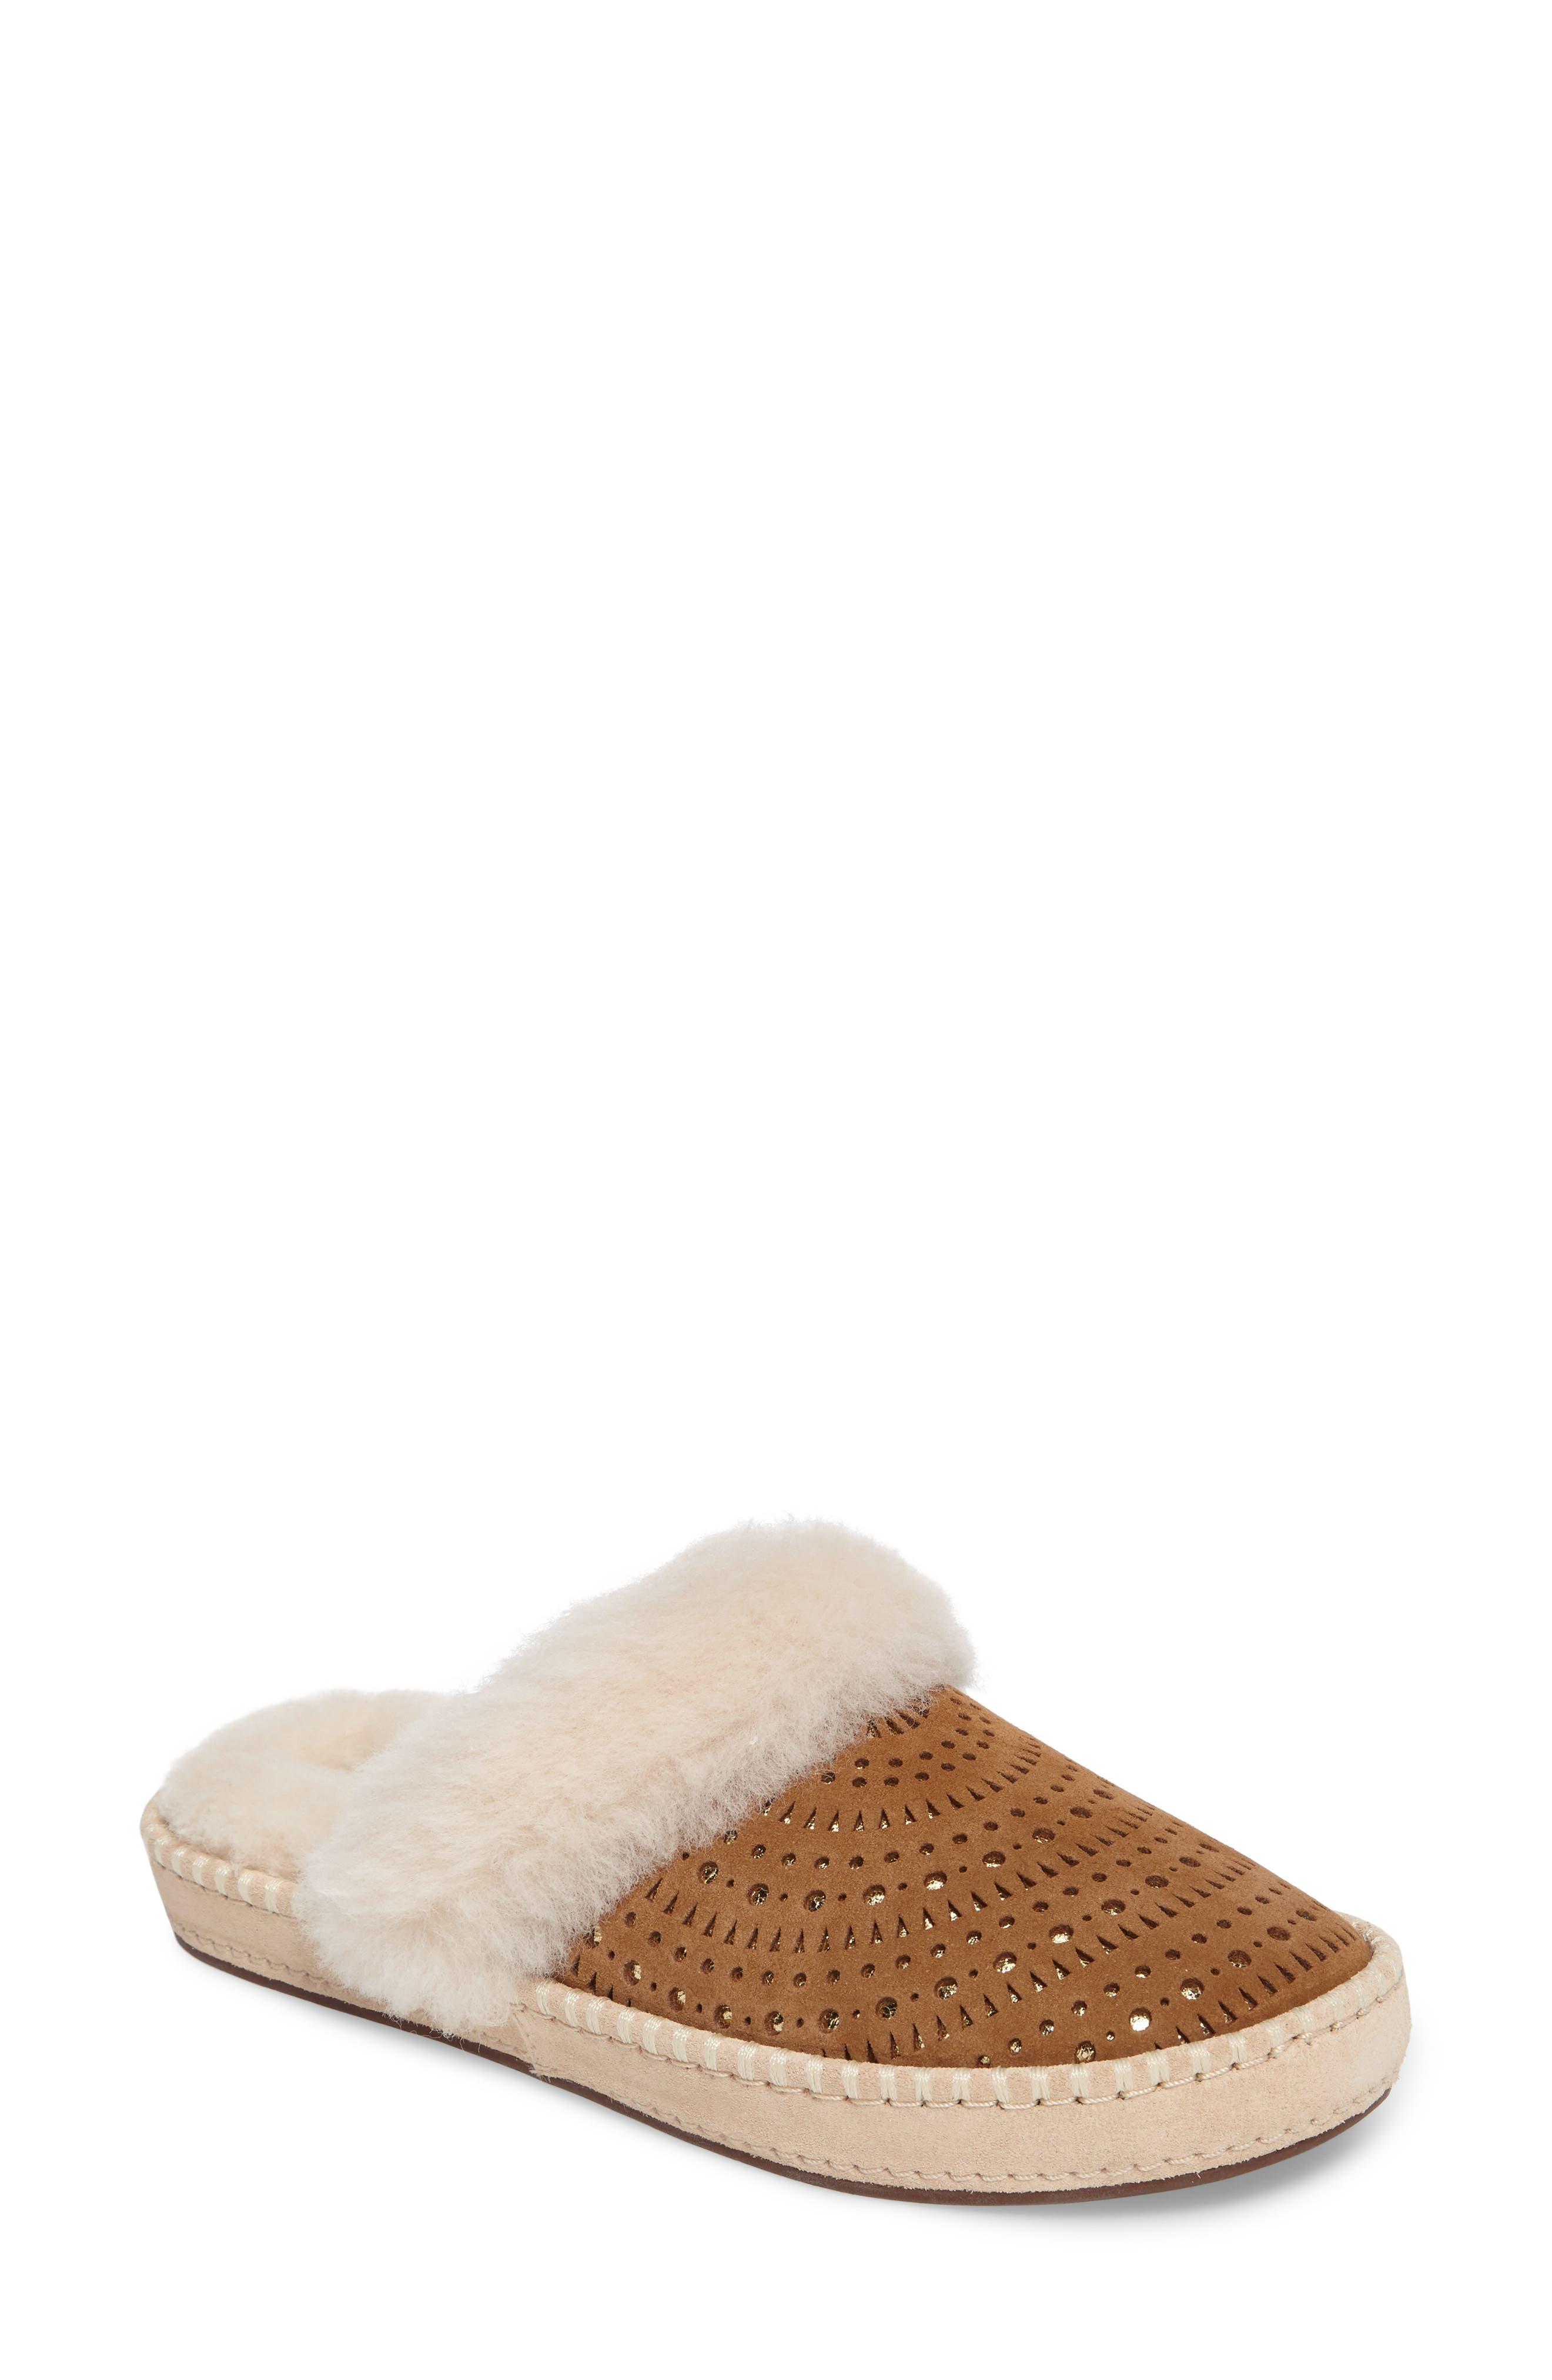 Aira Sunshine Genuine Shearling Slipper,                         Main,                         color, Chestnut Suede